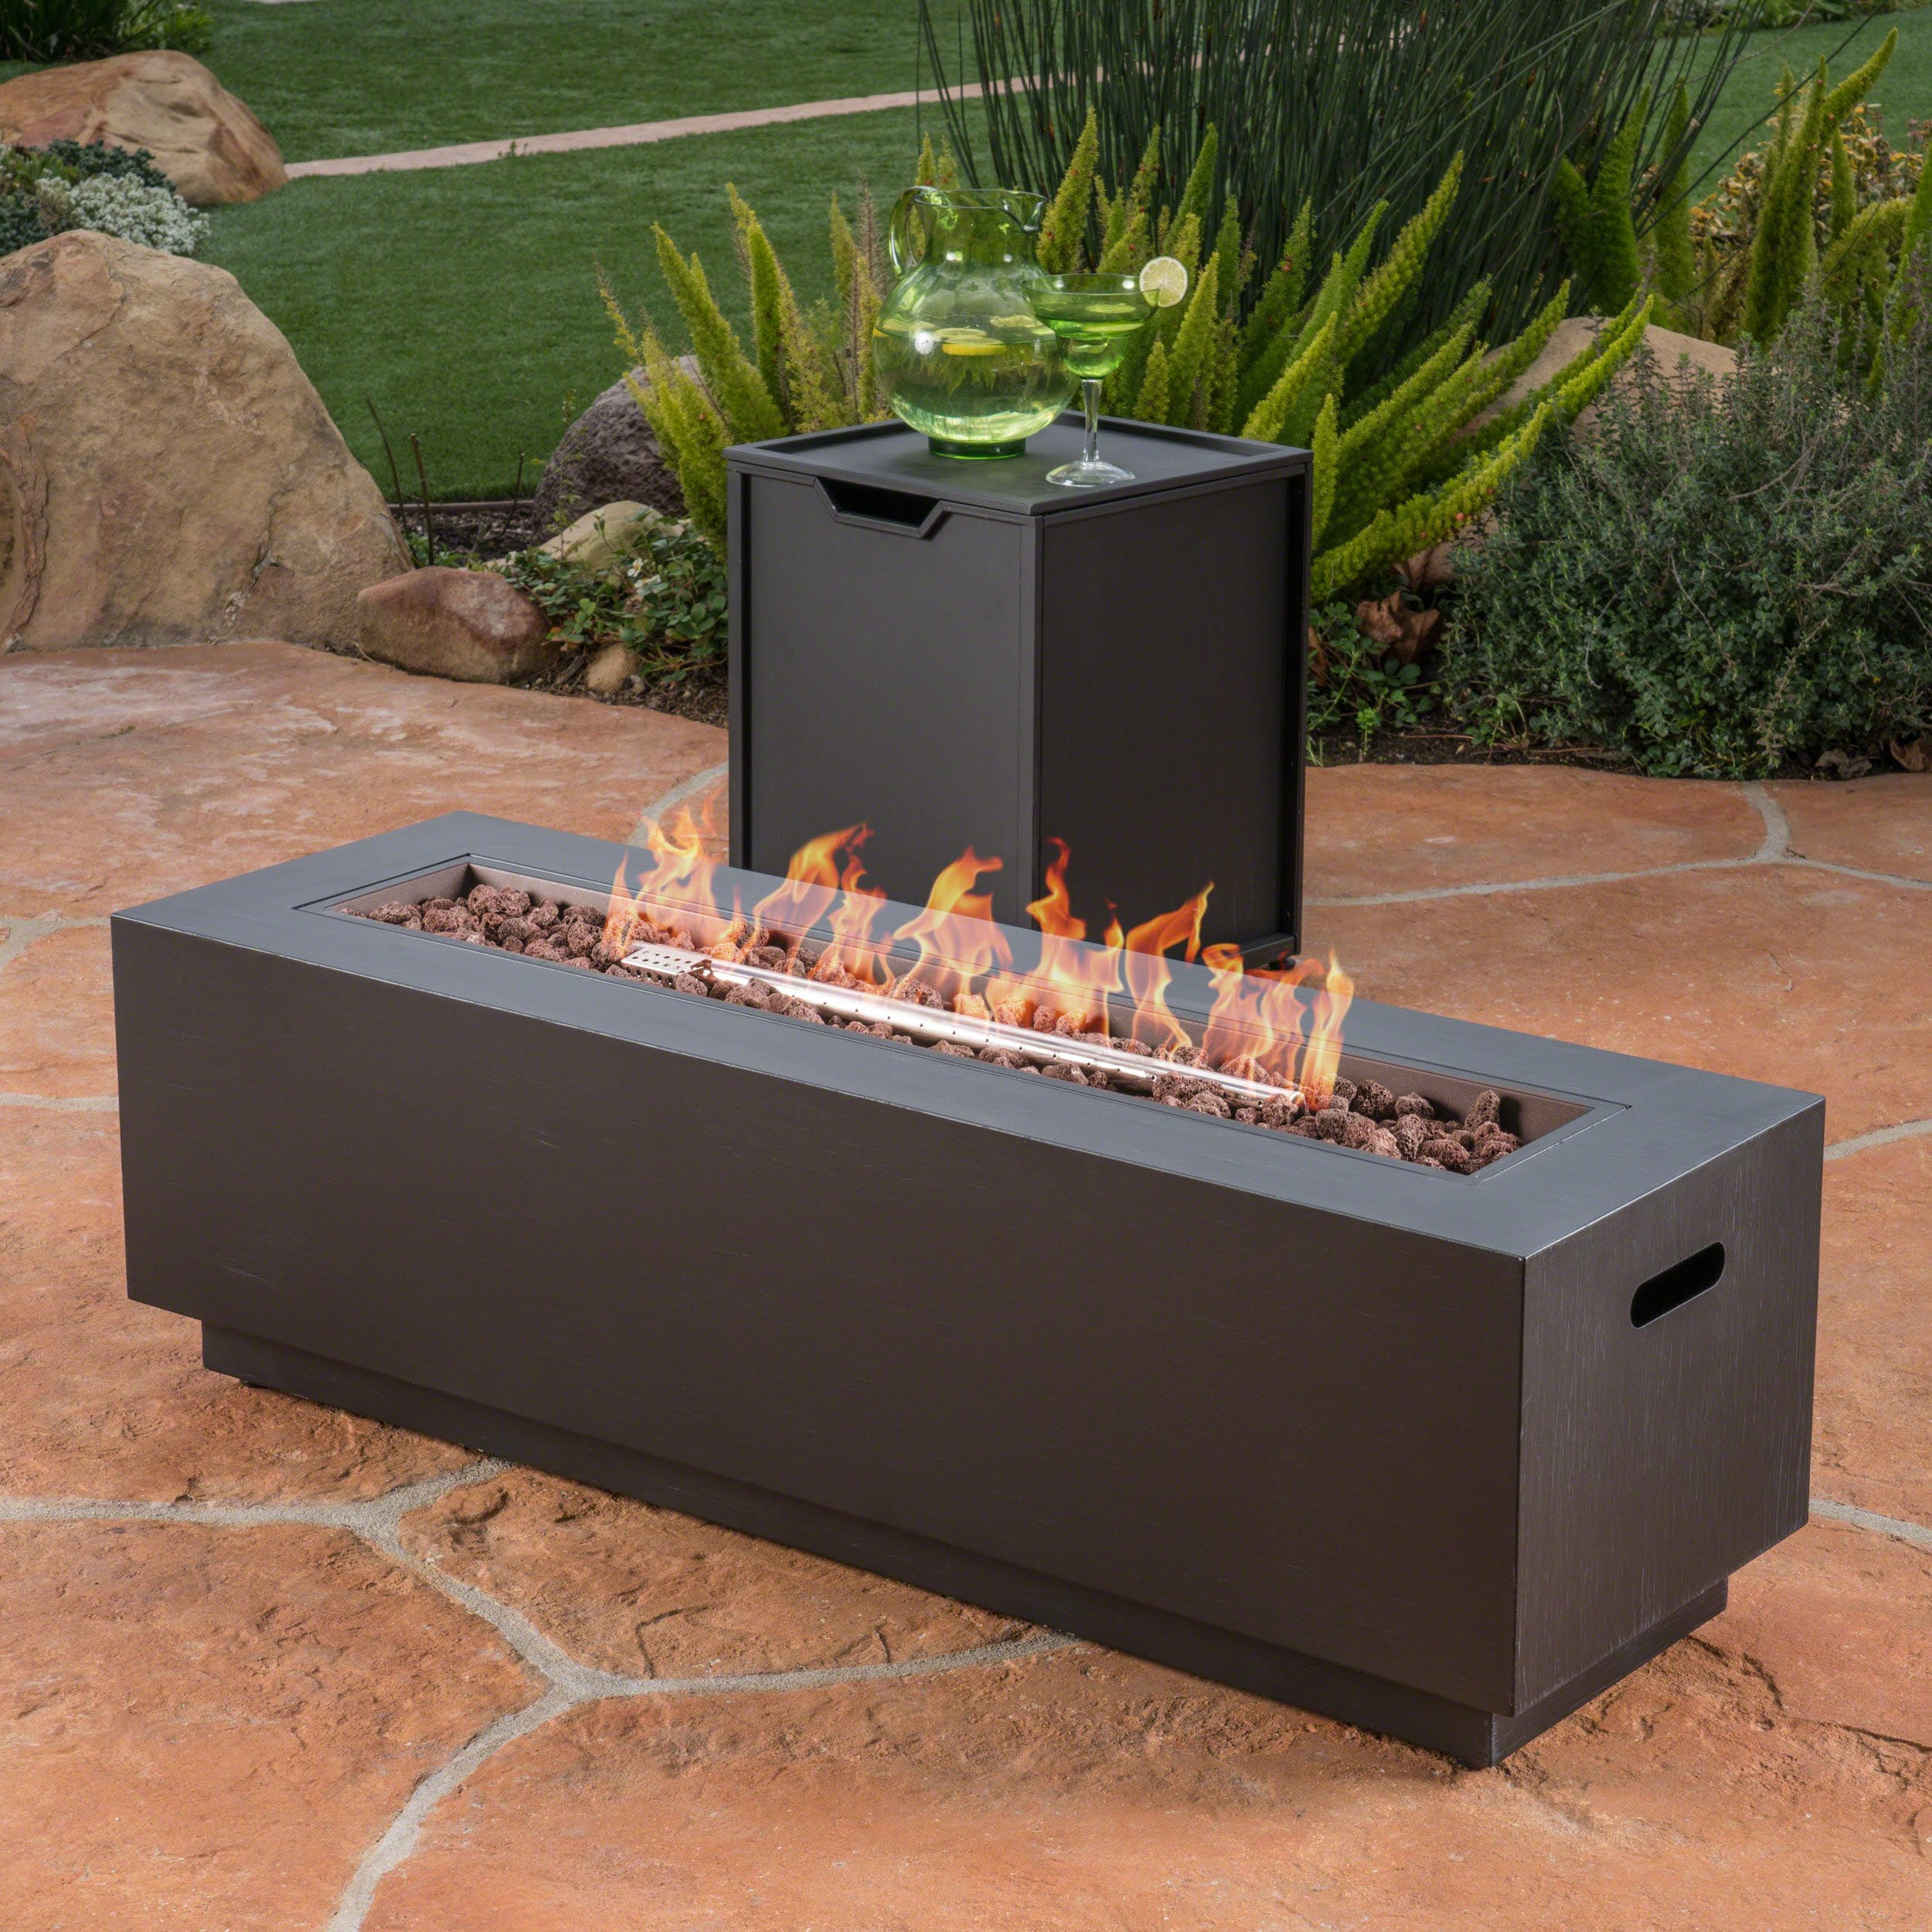 Great Deal Furniture 304017 Jasmine Outdoor Finish Iron Rectangular Fire Pit-50,000 BTU, Dark Grey